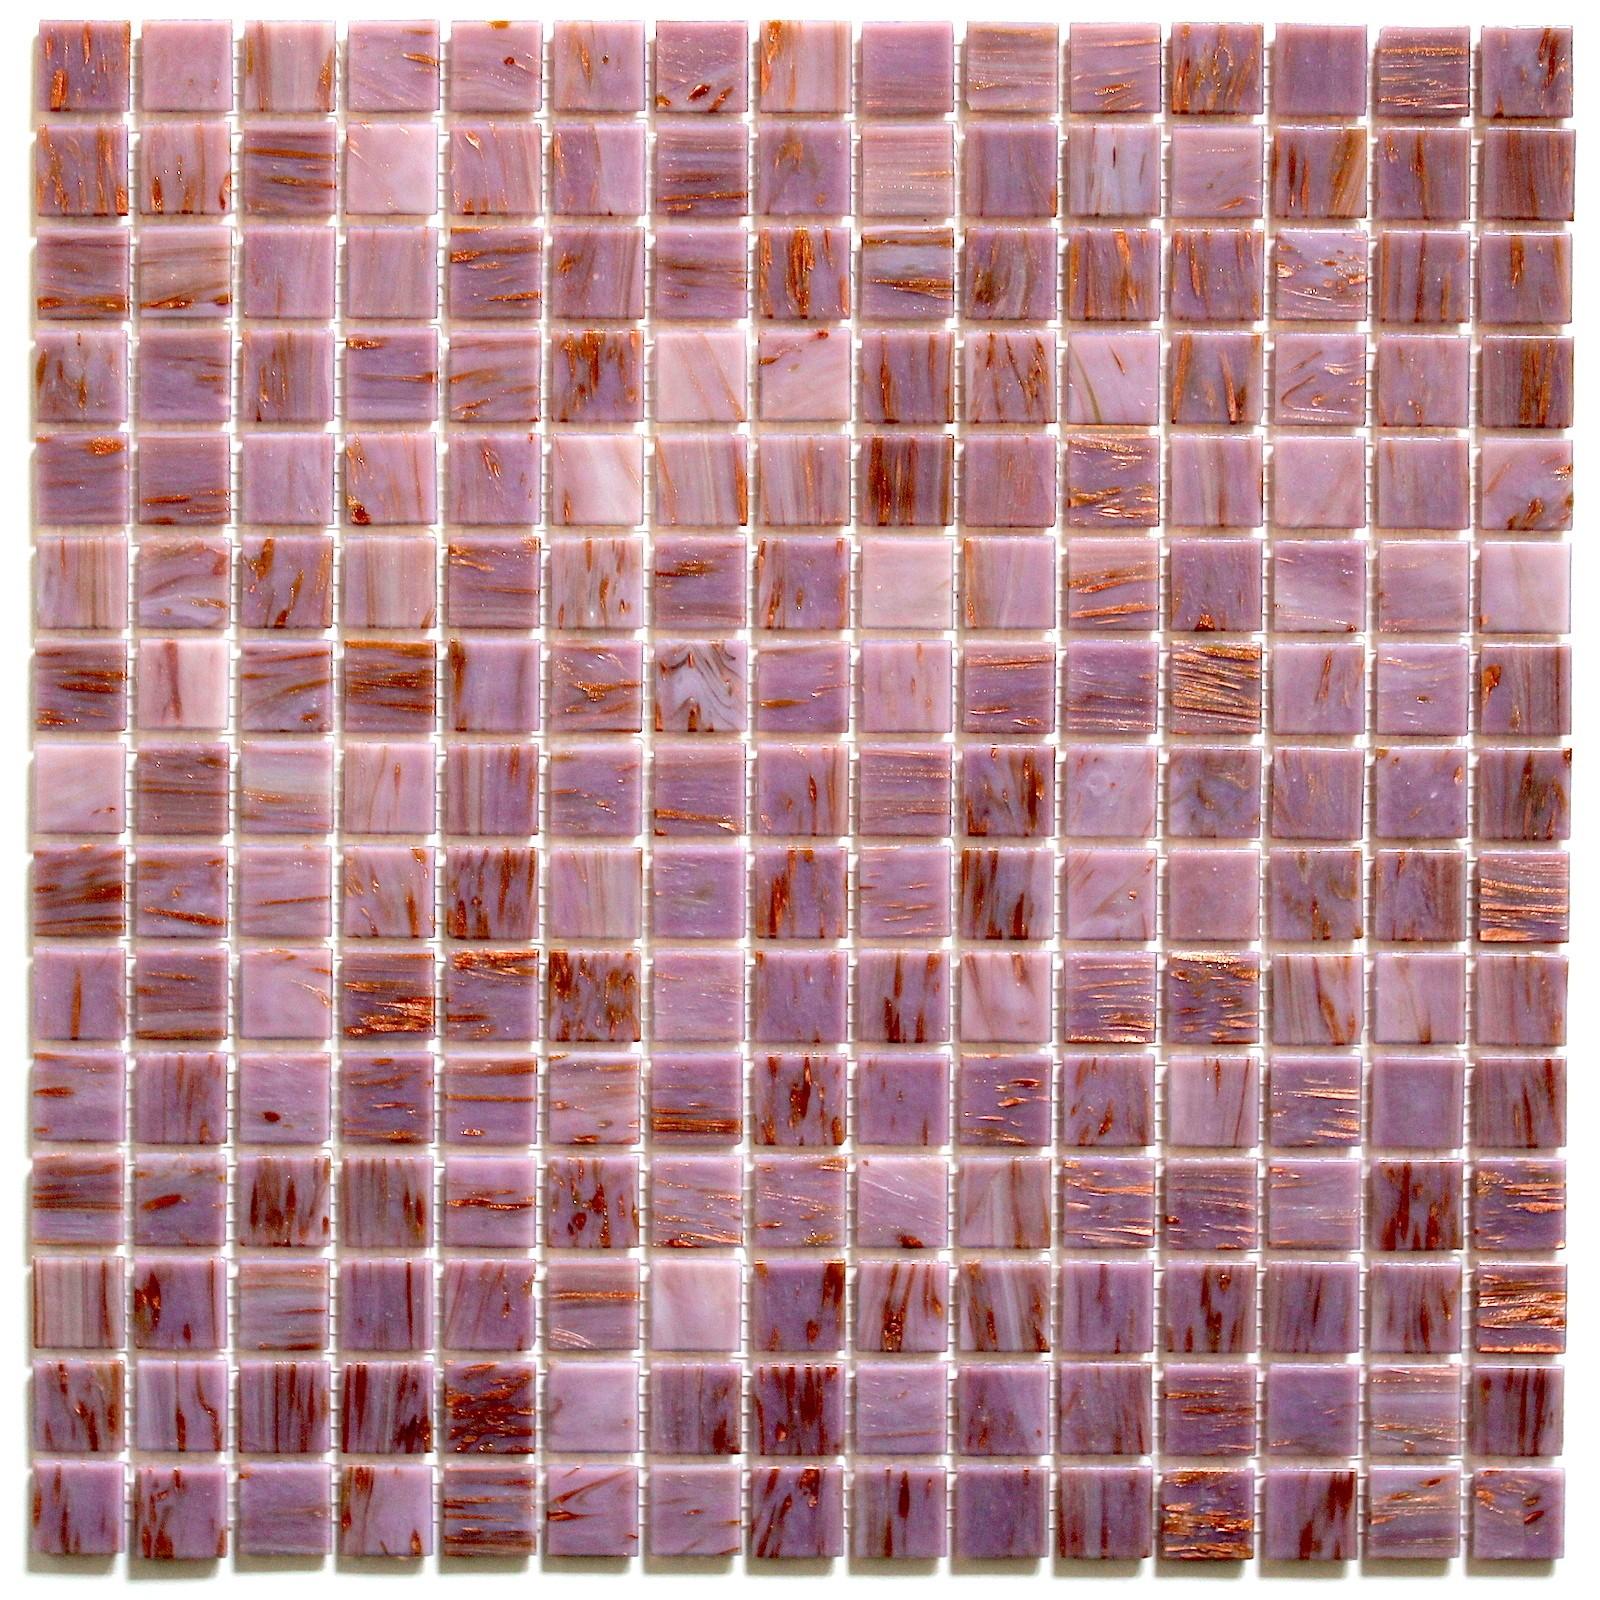 Carrelage Douche Piscine Salle De Bain Speculo Rose Carrelage Mosaique